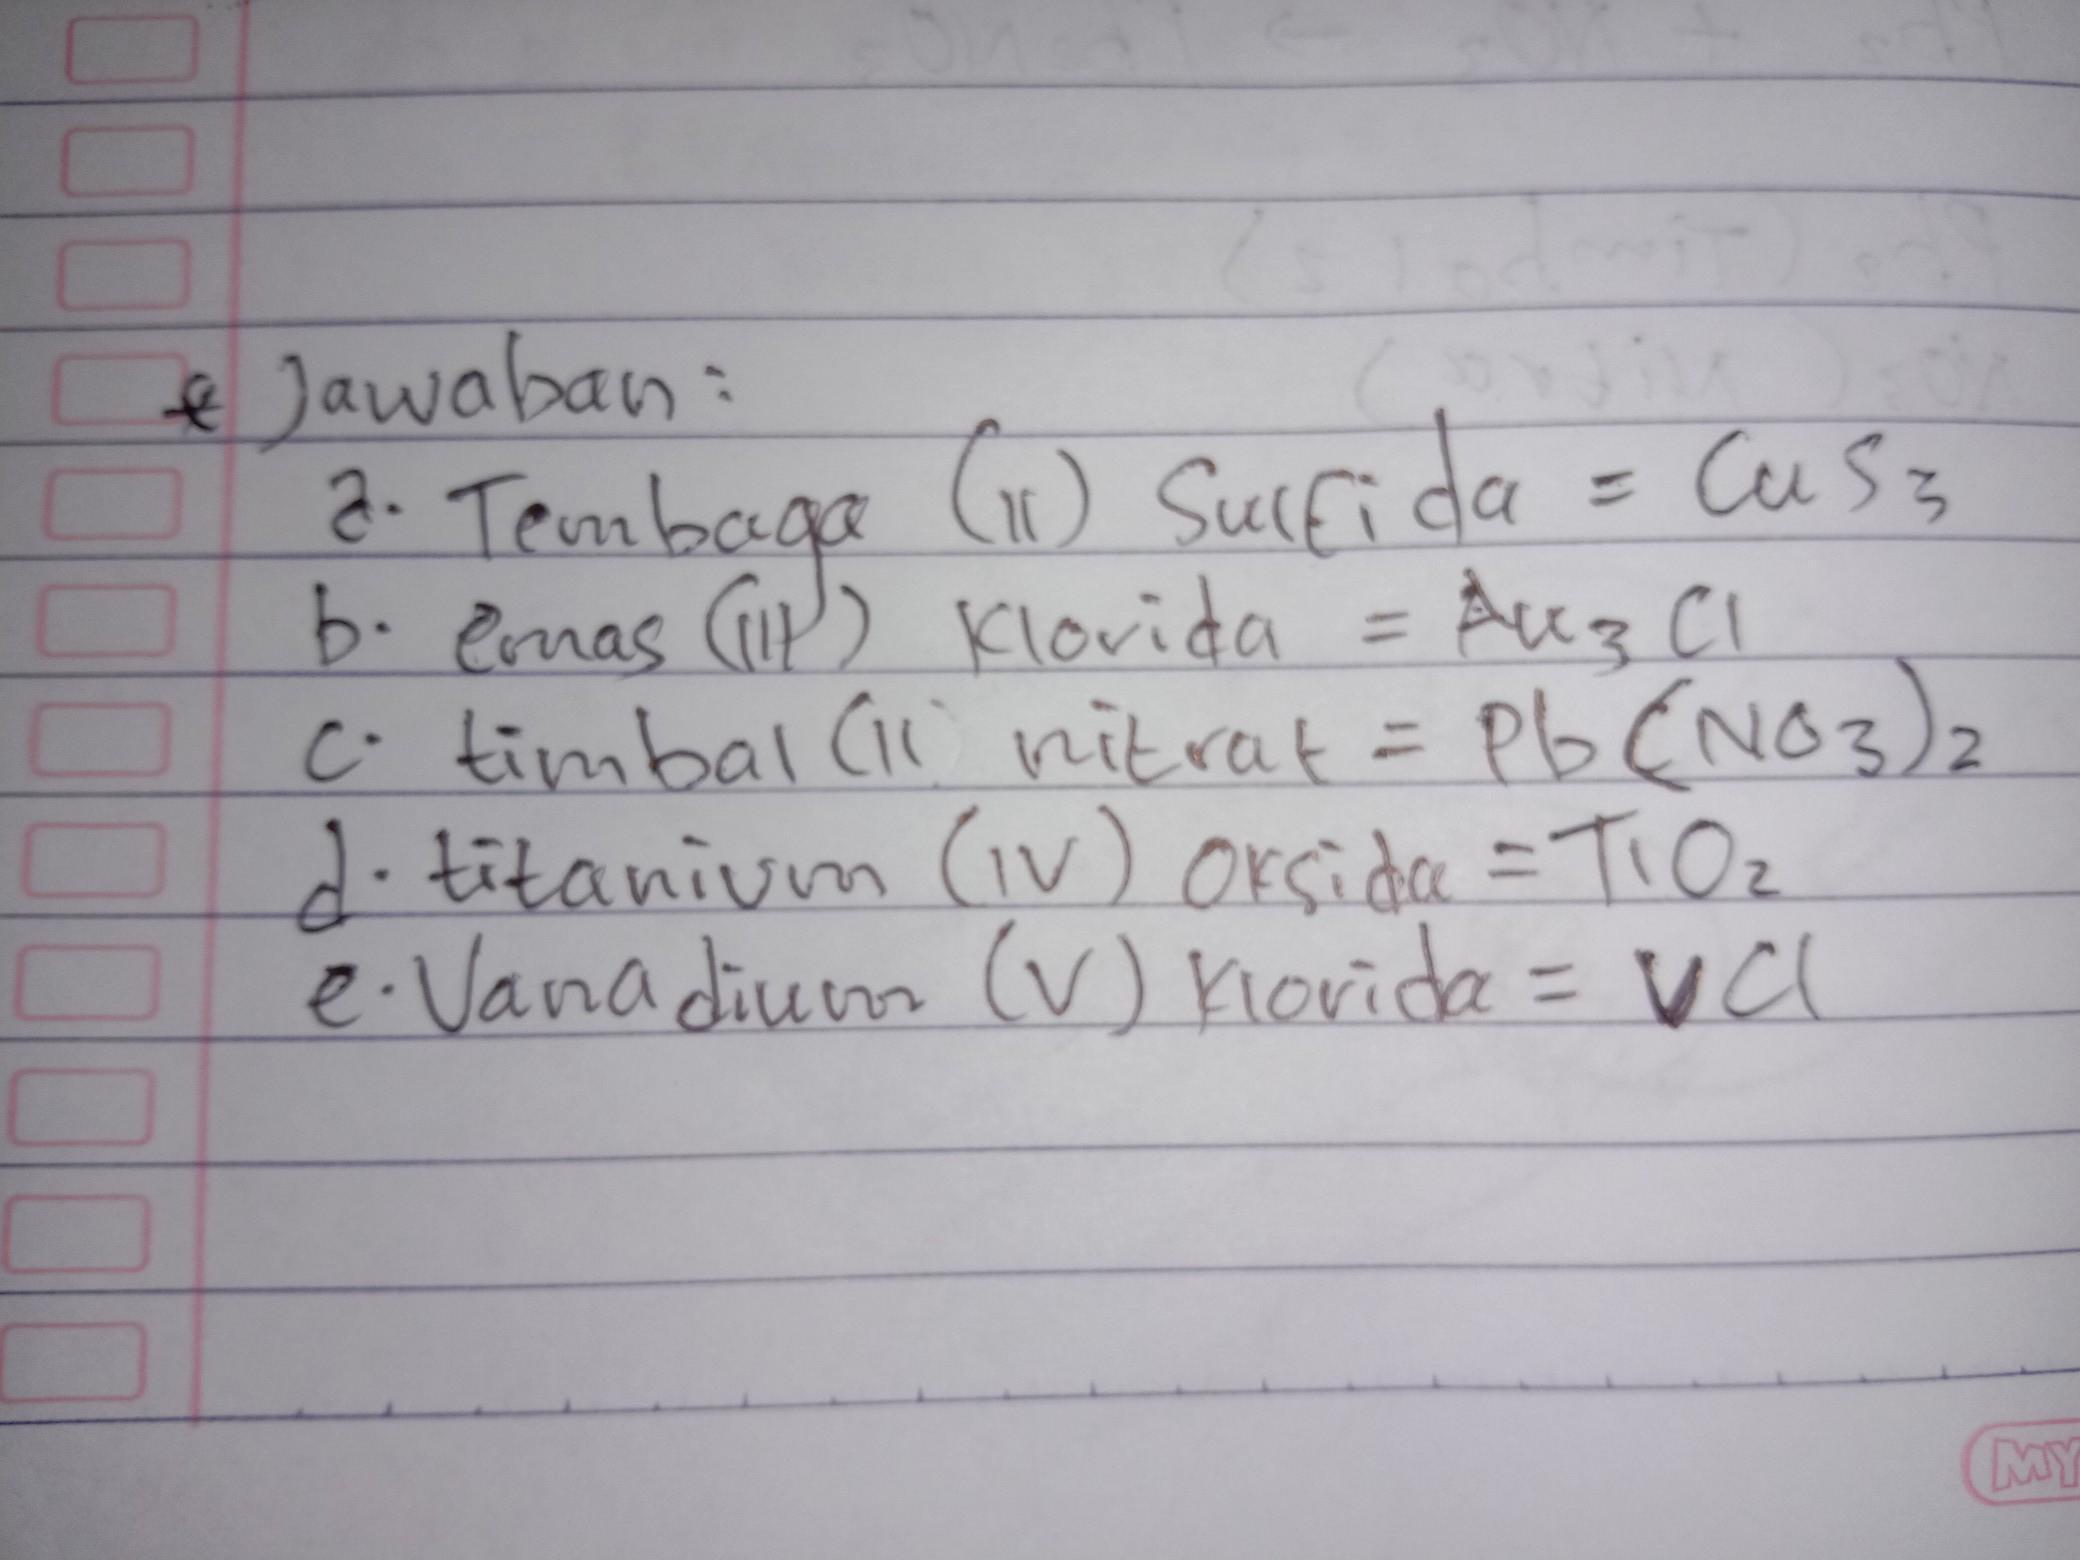 Tuliskan Rumus Kimia Dari Senyawa Berikut A Tembaga Ii Sulfida B Emas Iii Klorida C Timba Ii Brainly Co Id